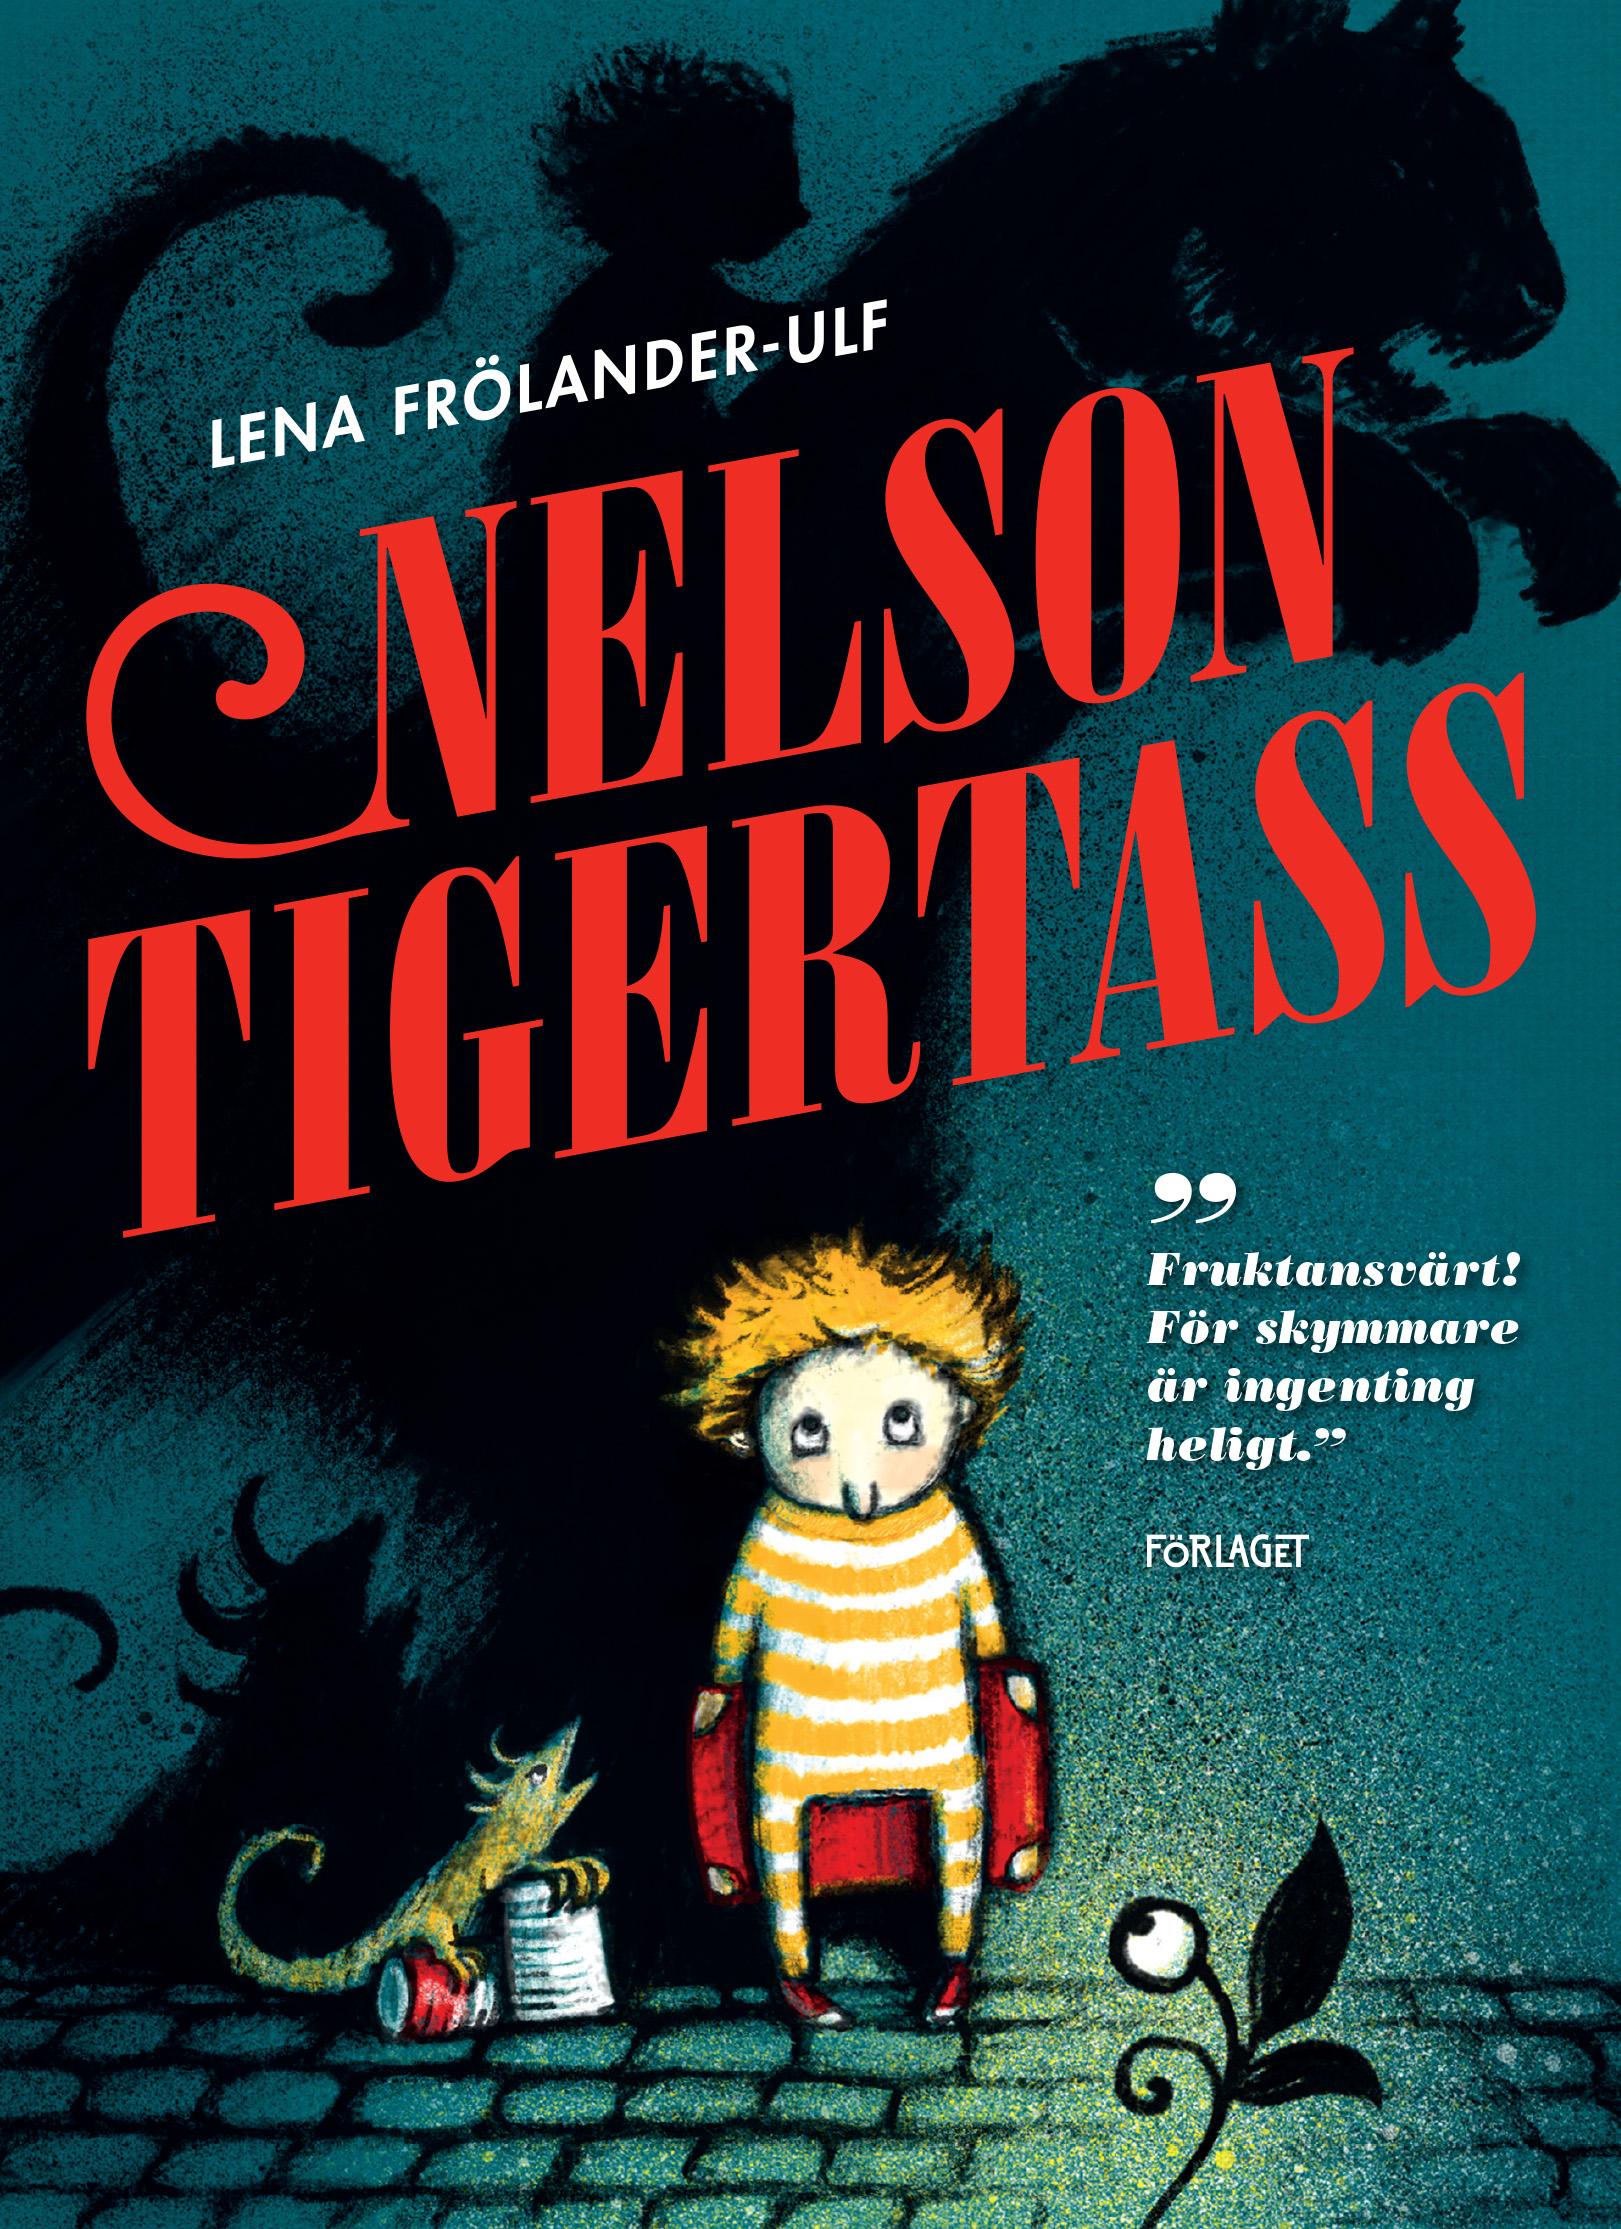 Lena Frölander-Ulf: Nelson Tigertass